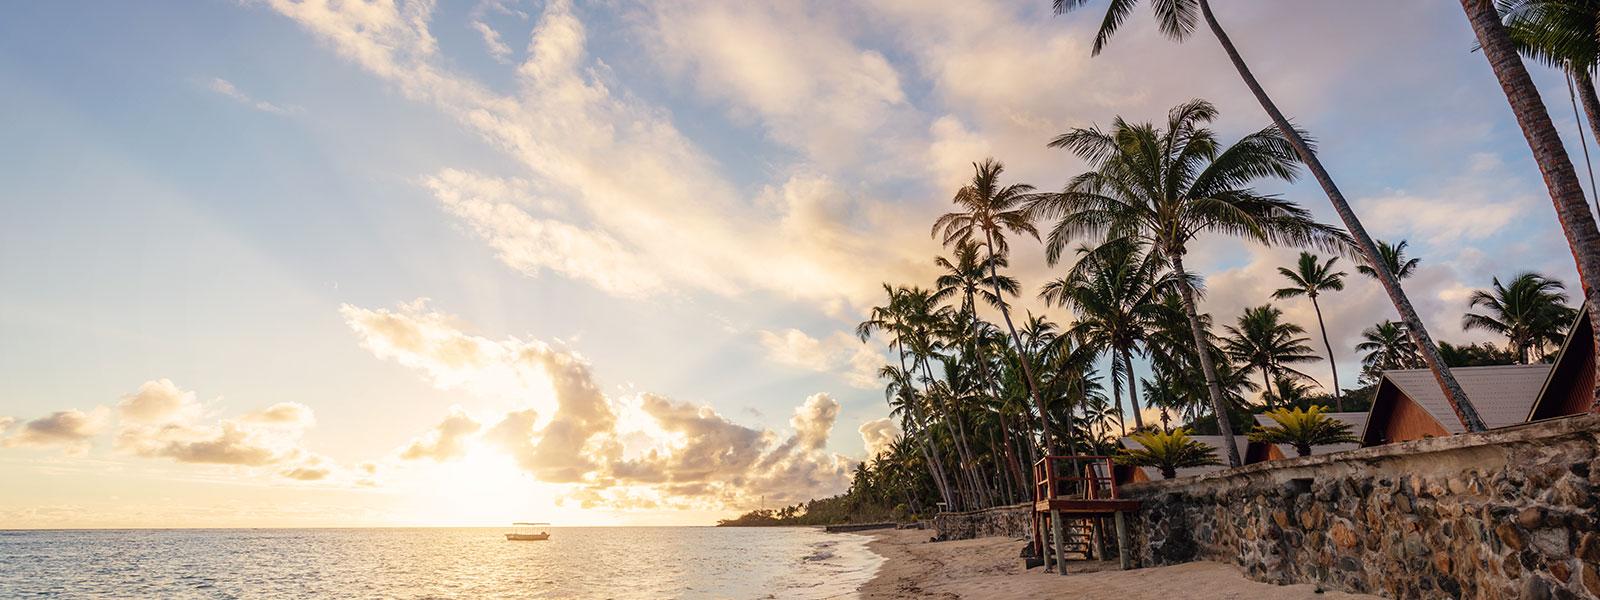 Fijian beach at sunset